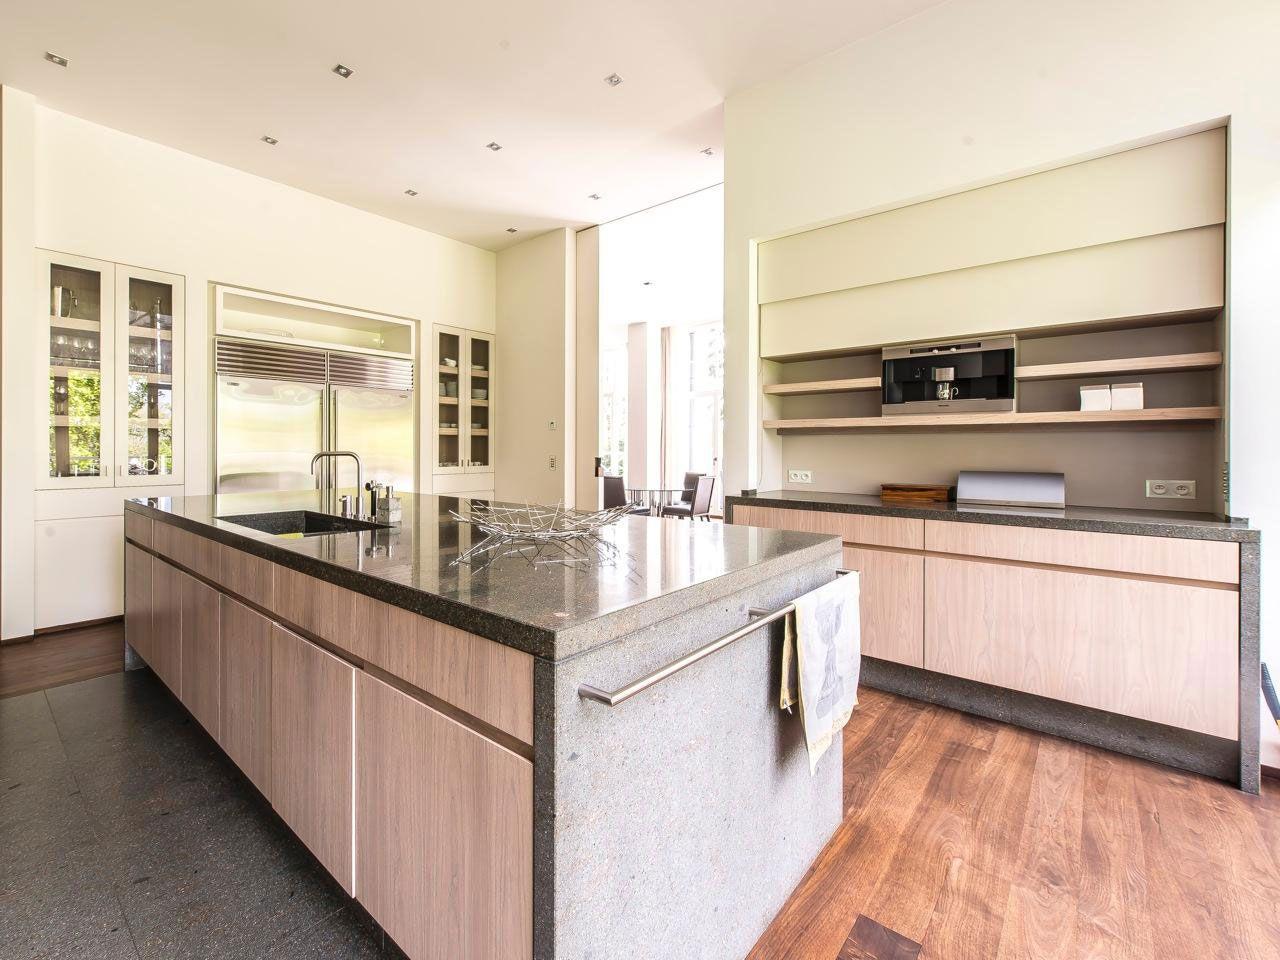 Chic Elegant Apartment in Brussels With Bright Interiors-12